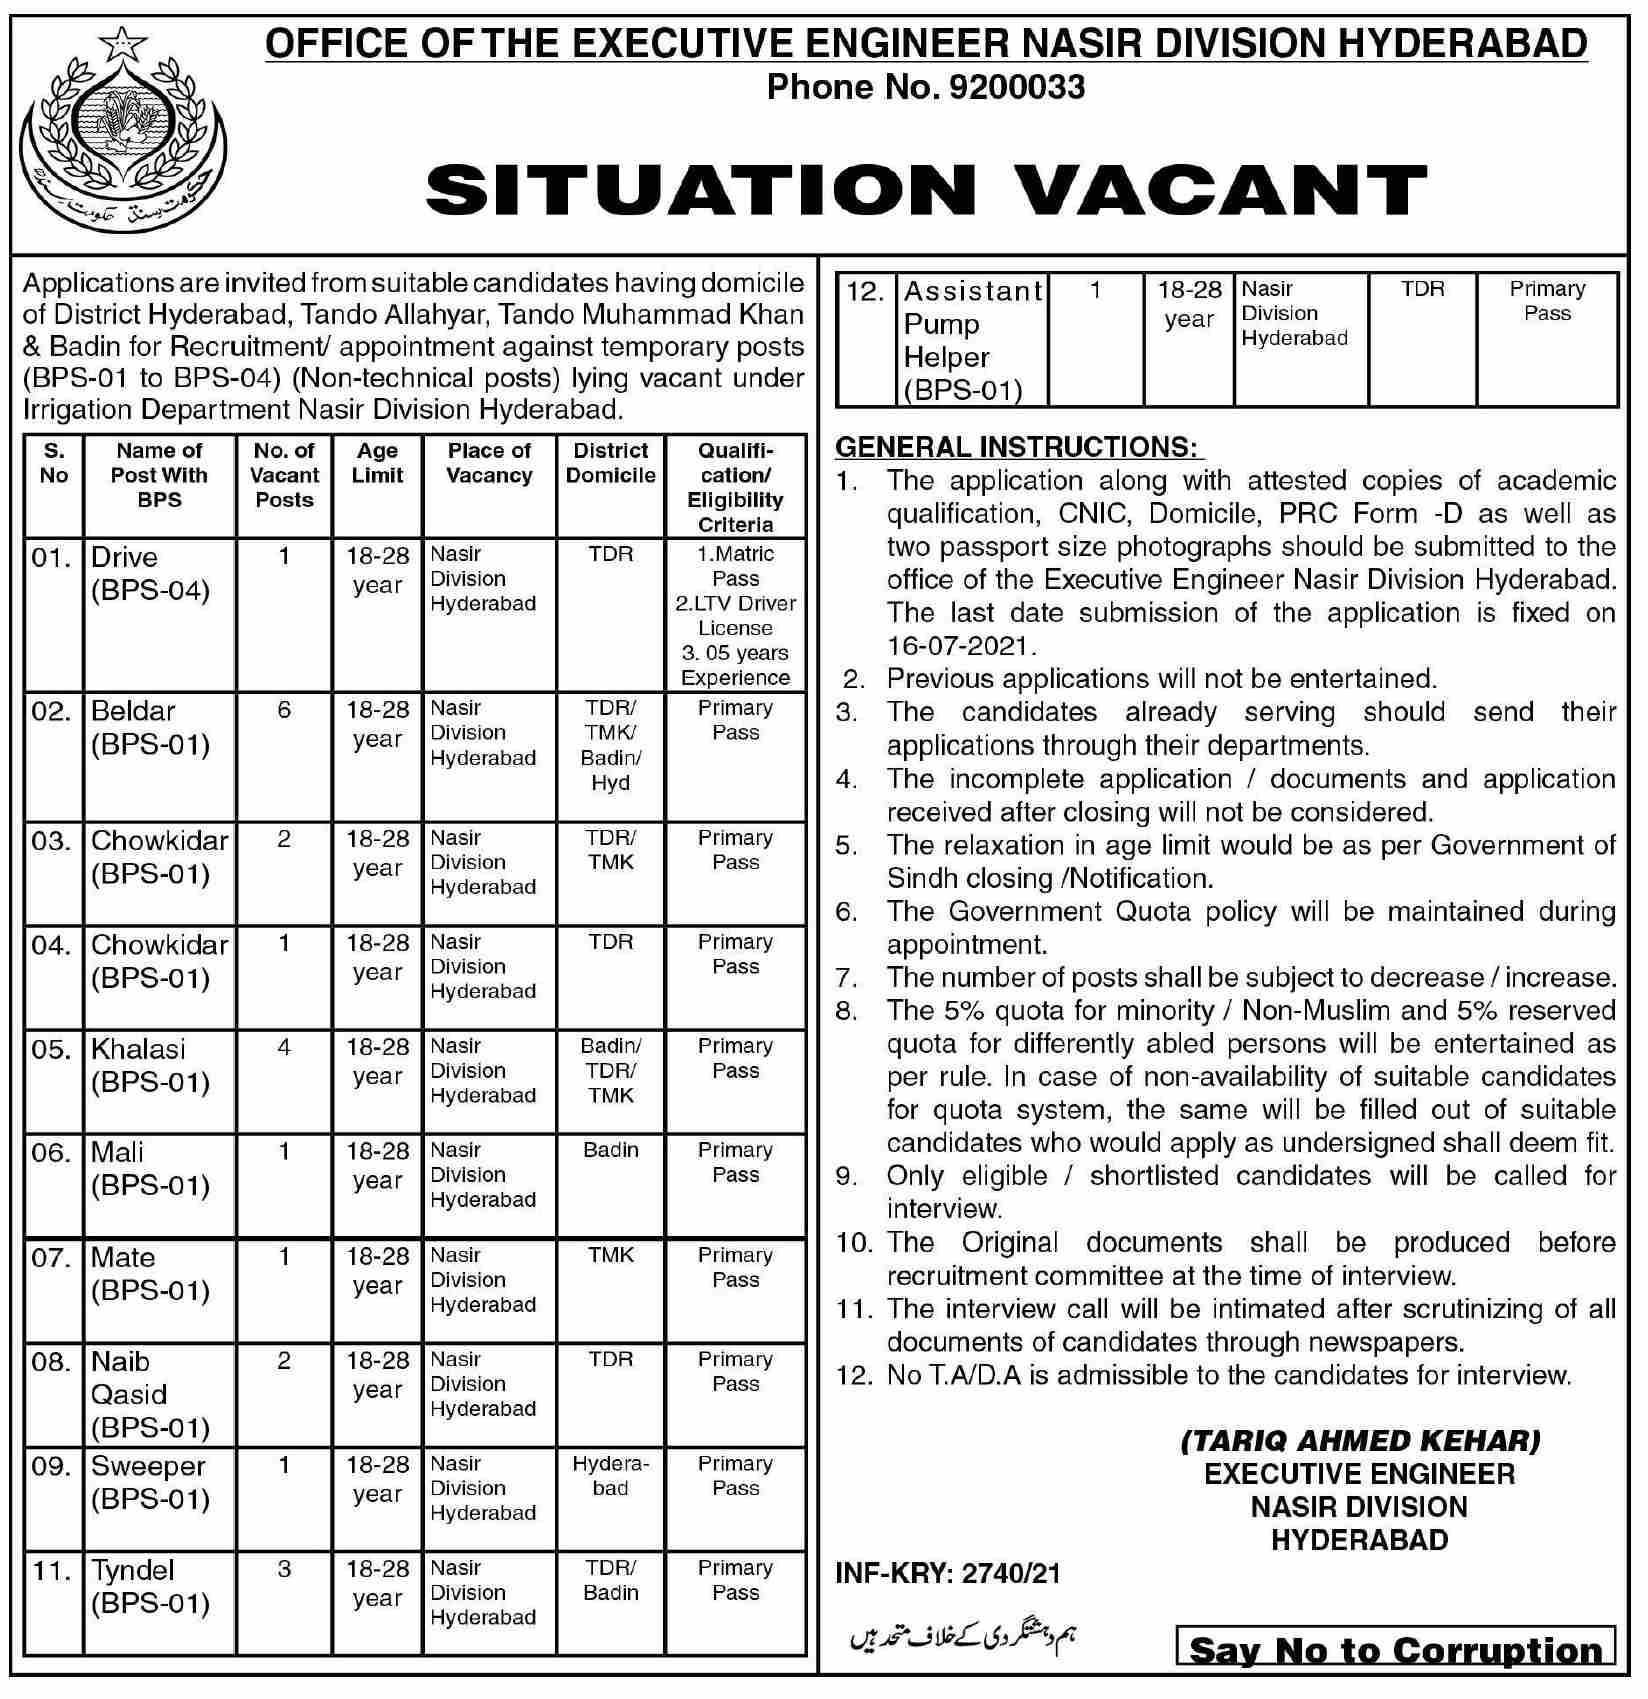 Executive Engineer Office NASIR Division Hyderabad Jobs 2021